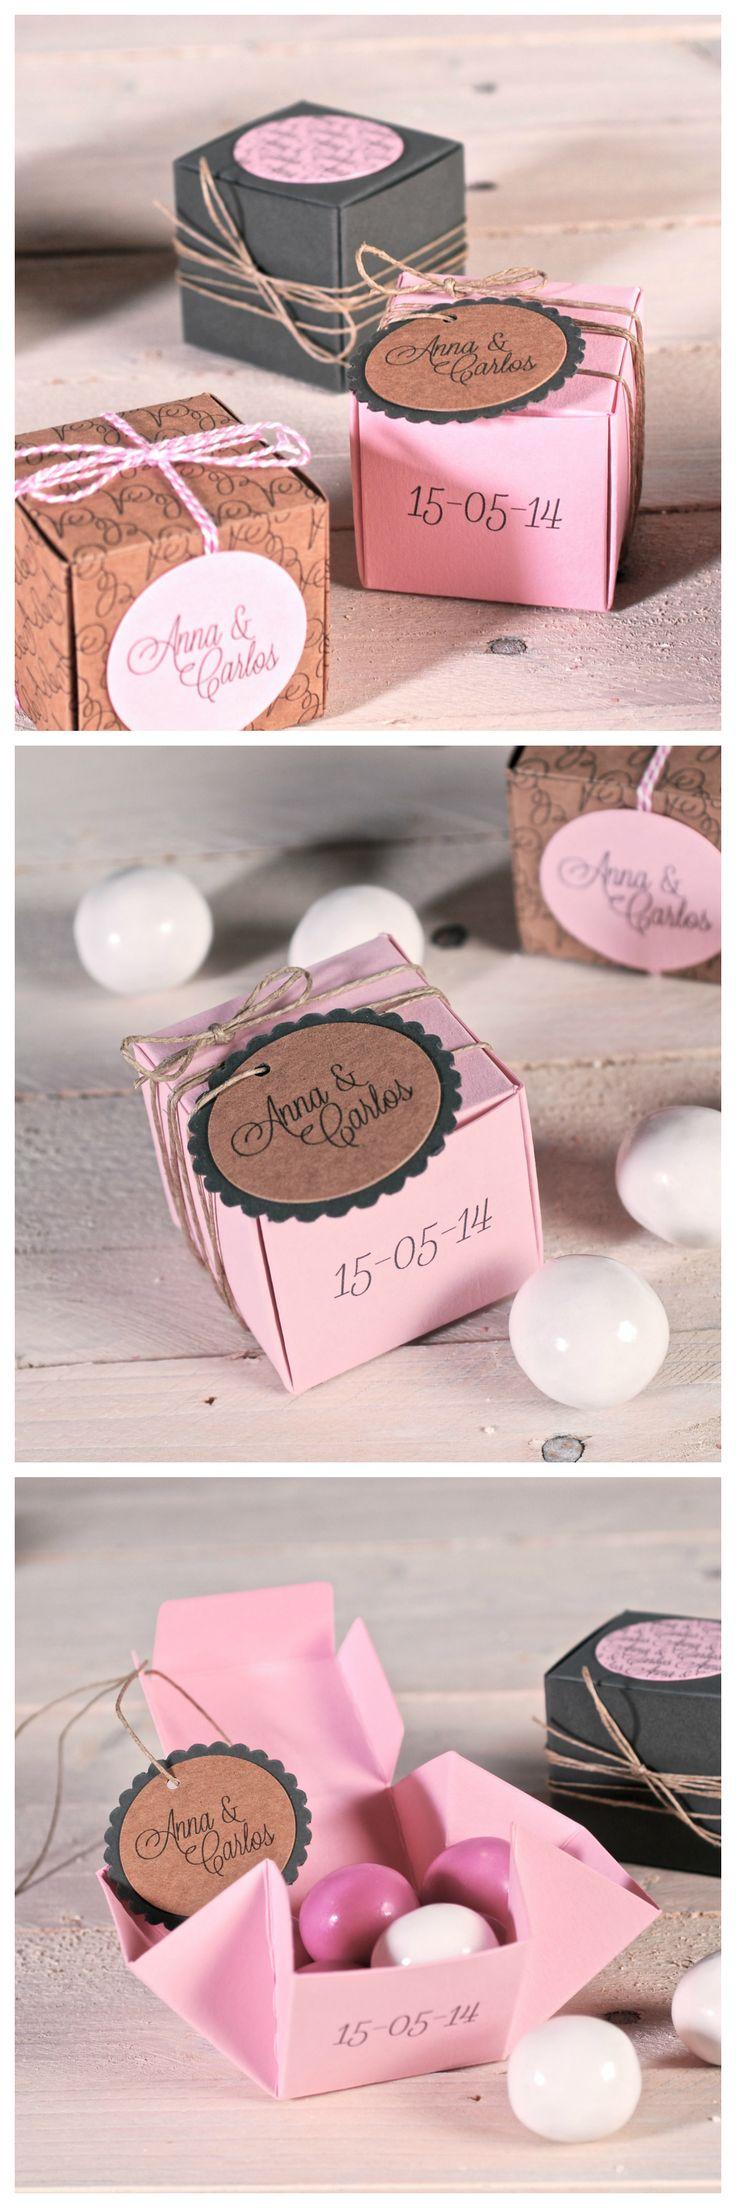 wedding boxes decorated by selfpackaging, ref. 1505-S  www.selfpackaging.com